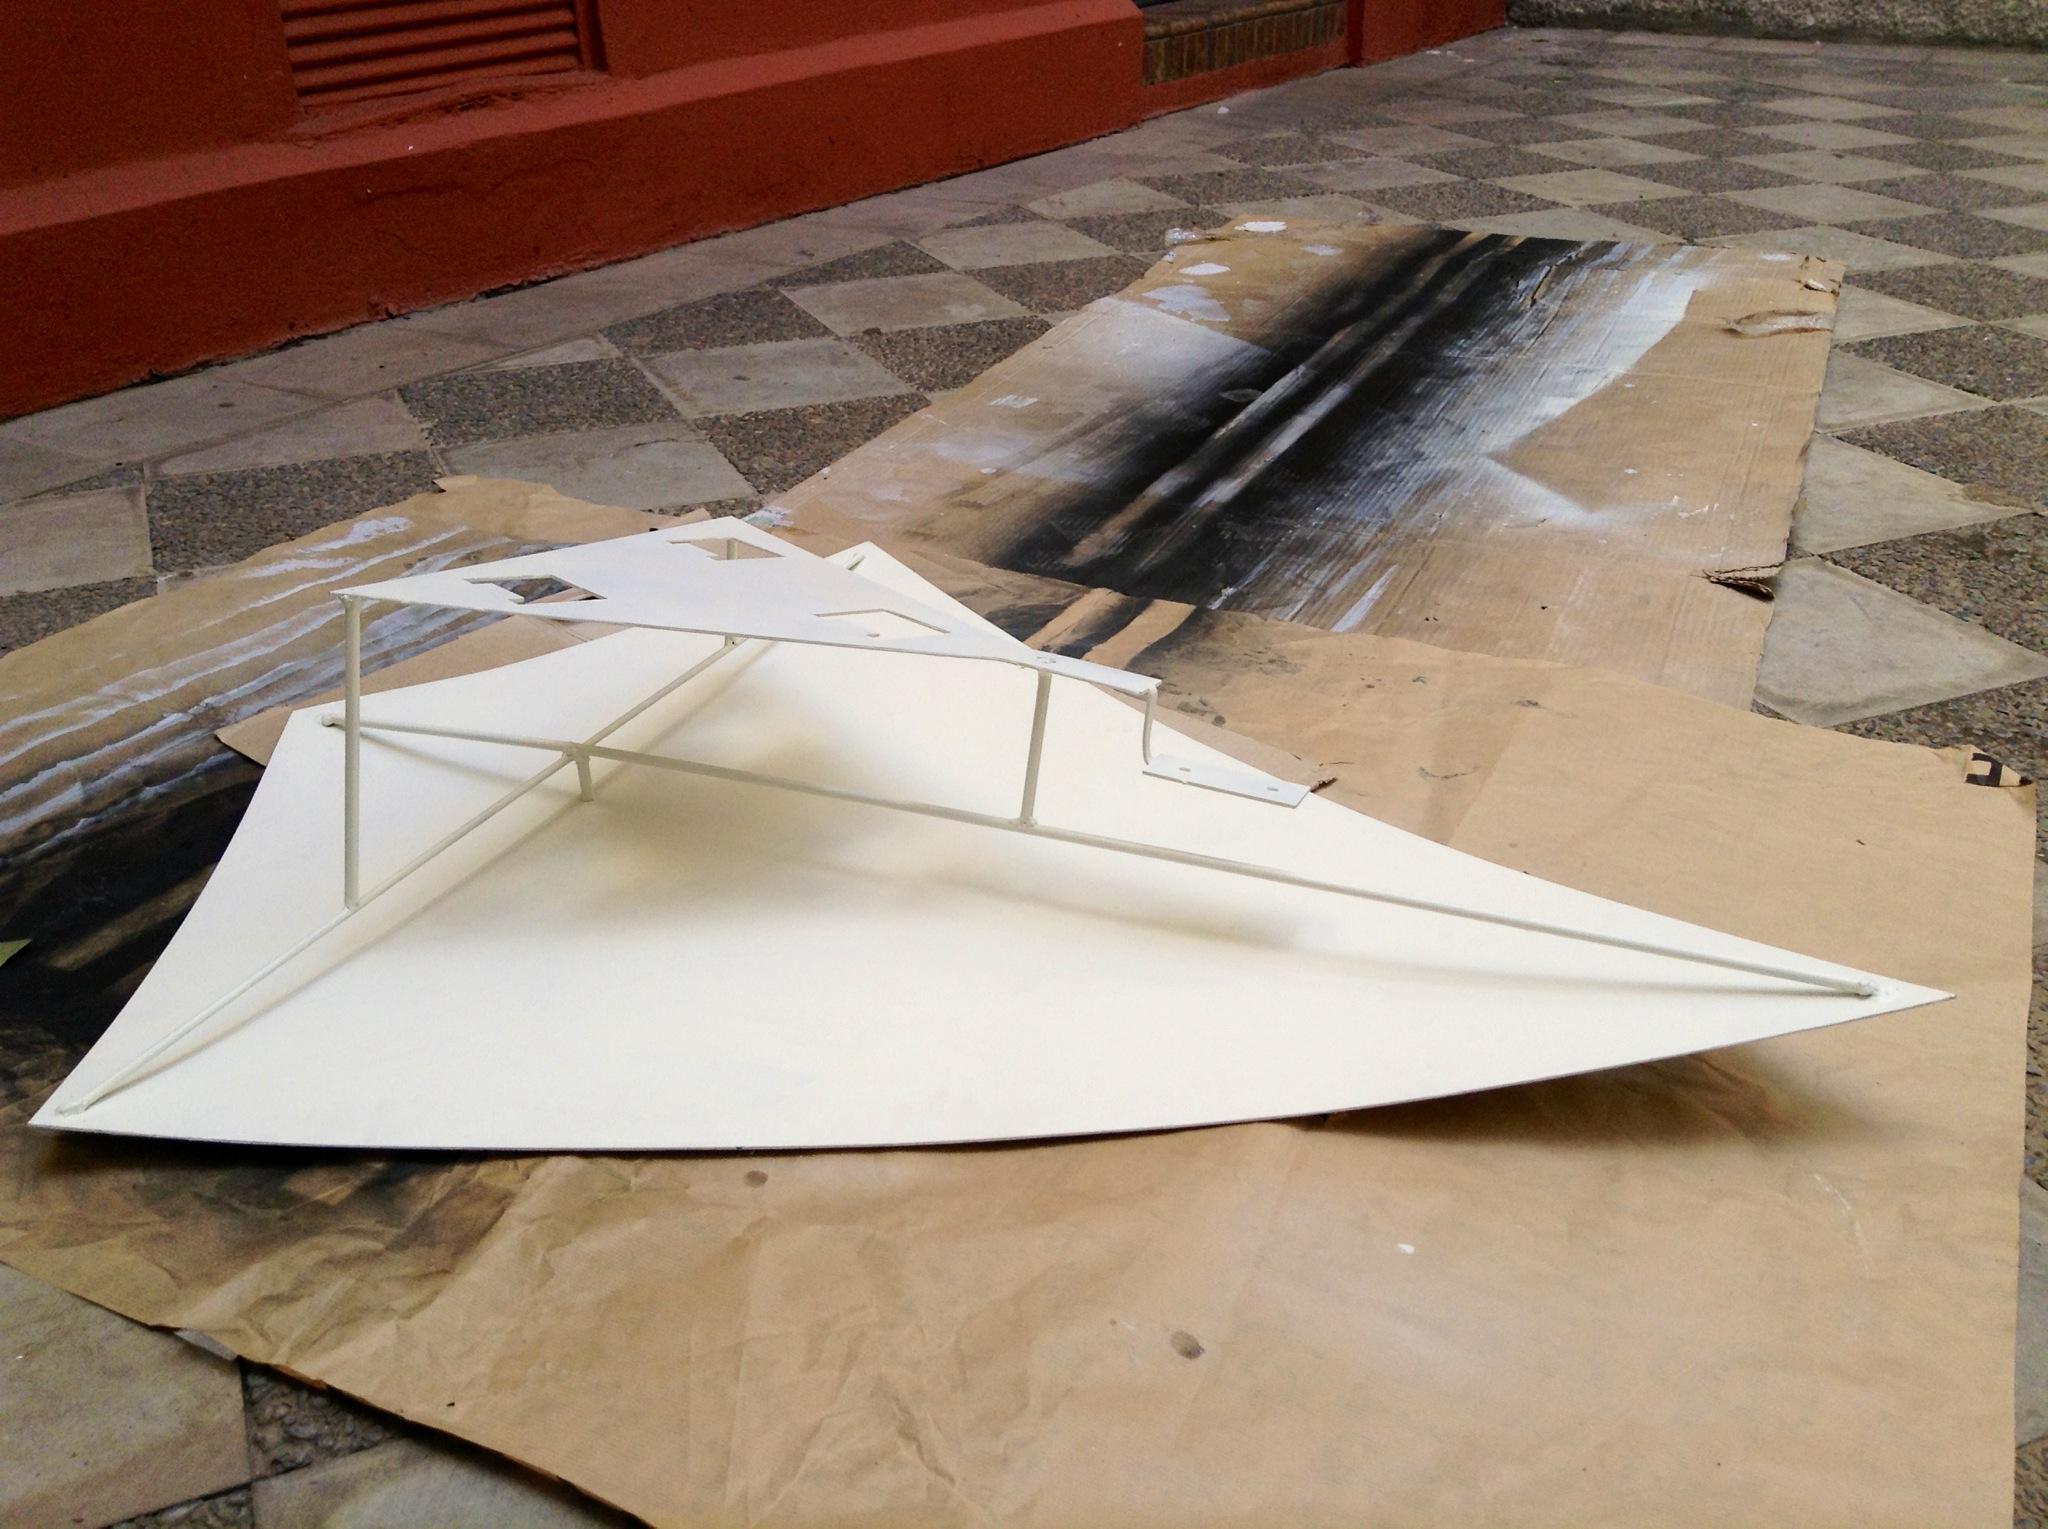 Kites Construction 005.JPG